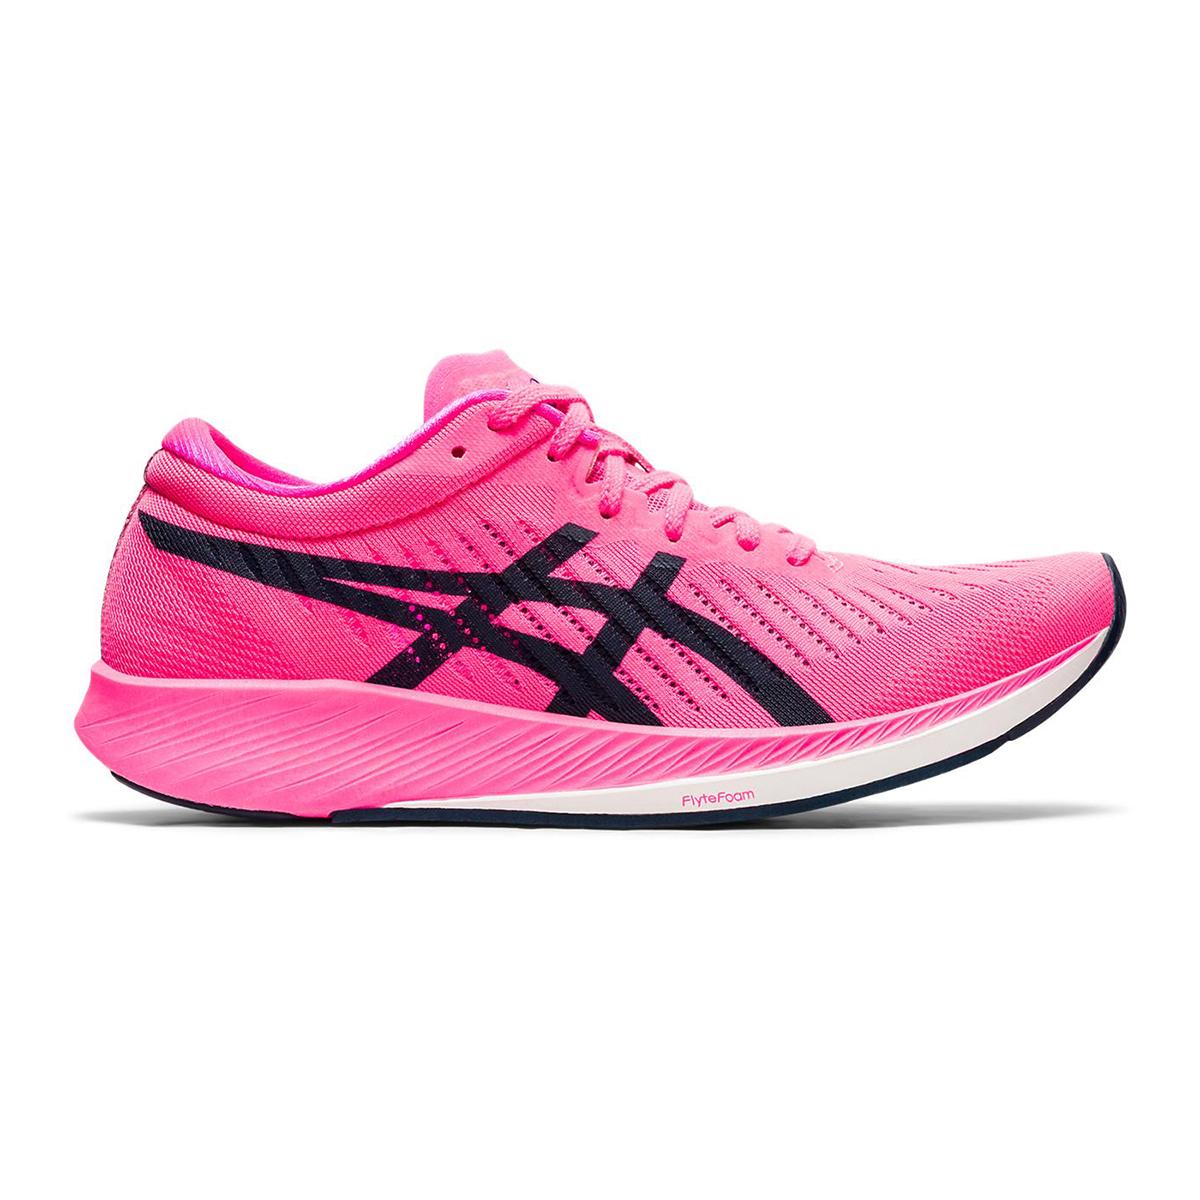 Women's Asics Metaracer Running Shoe - Color: Hot Pink/French Blue - Size: 5 - Width: Regular, Hot Pink/French Blue, large, image 1